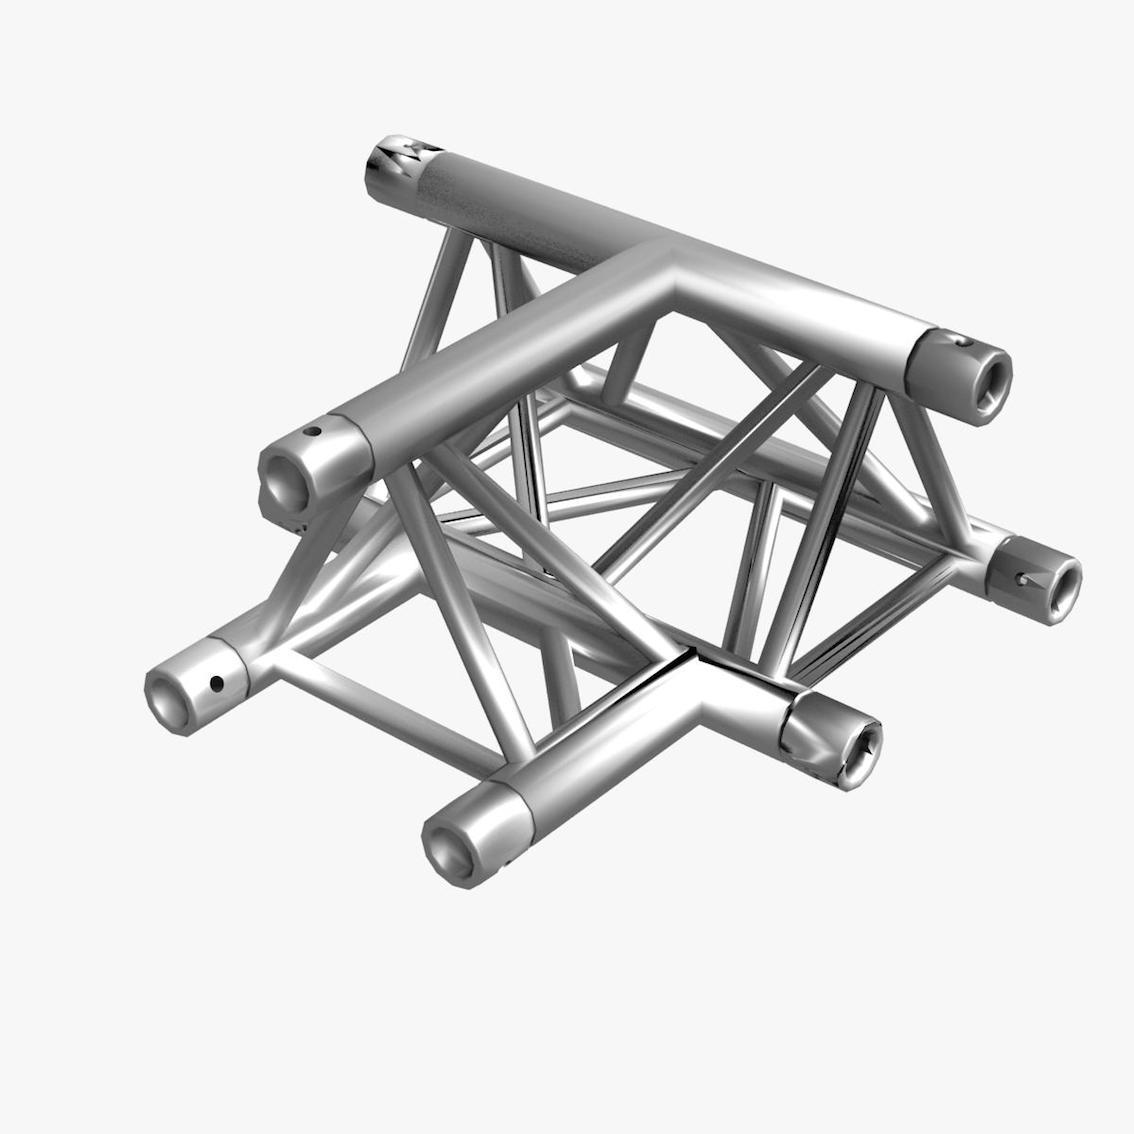 Triangular Truss Cross T Junction 84 3d model 3ds max dxf fbx b3d c4d  obj 268954